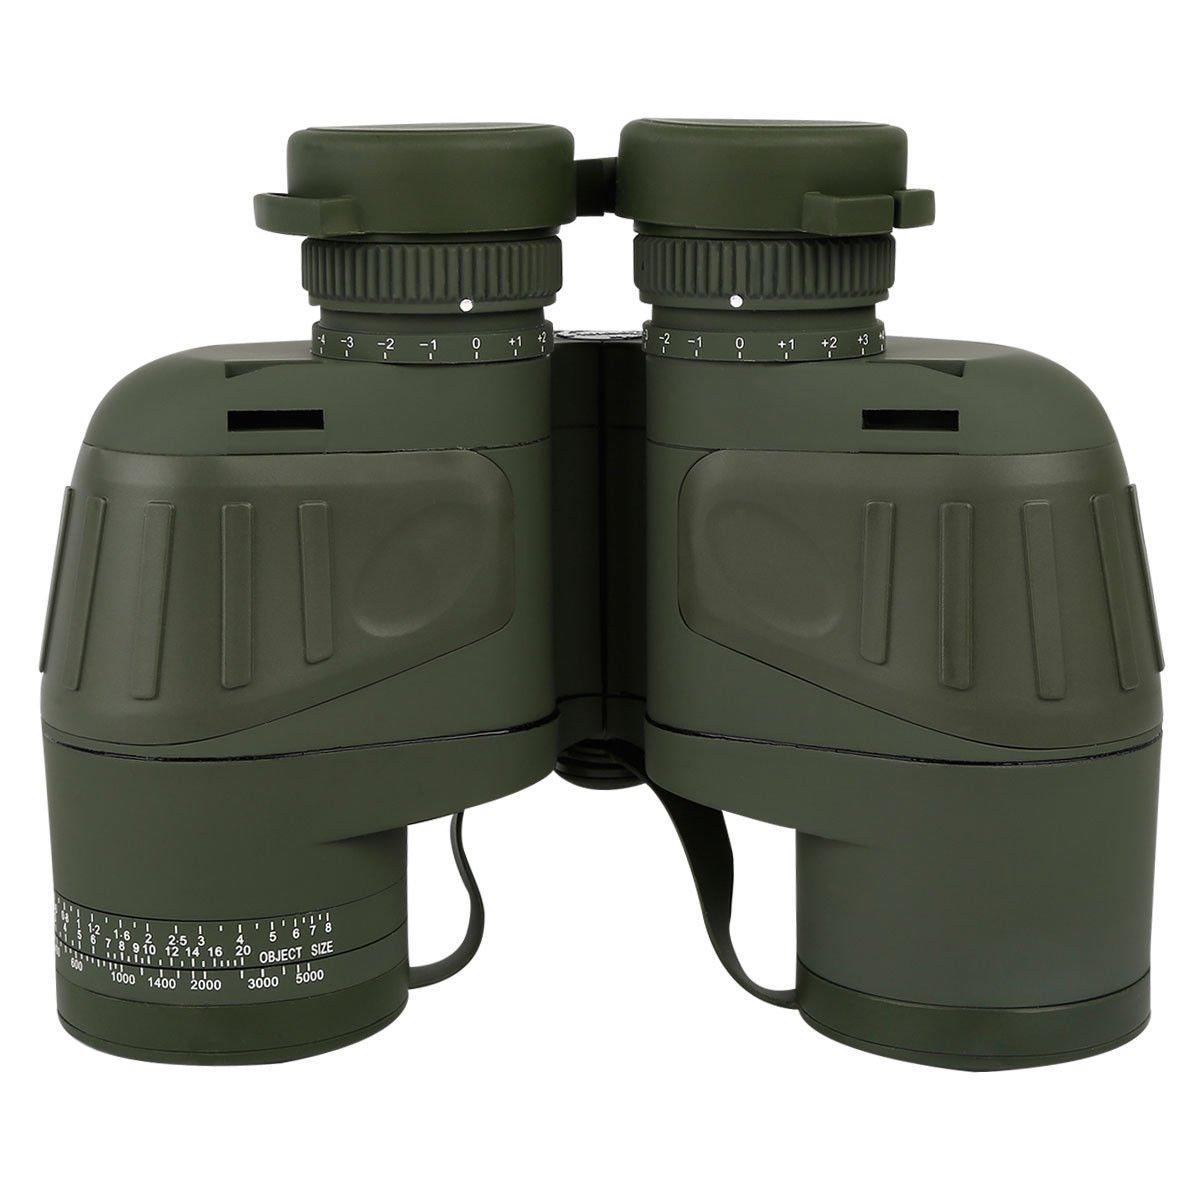 TC-Home 10X50 Night Vision Binoculars Marine Waterproof w/Rangefinder&Compass (Green) by TC-Home